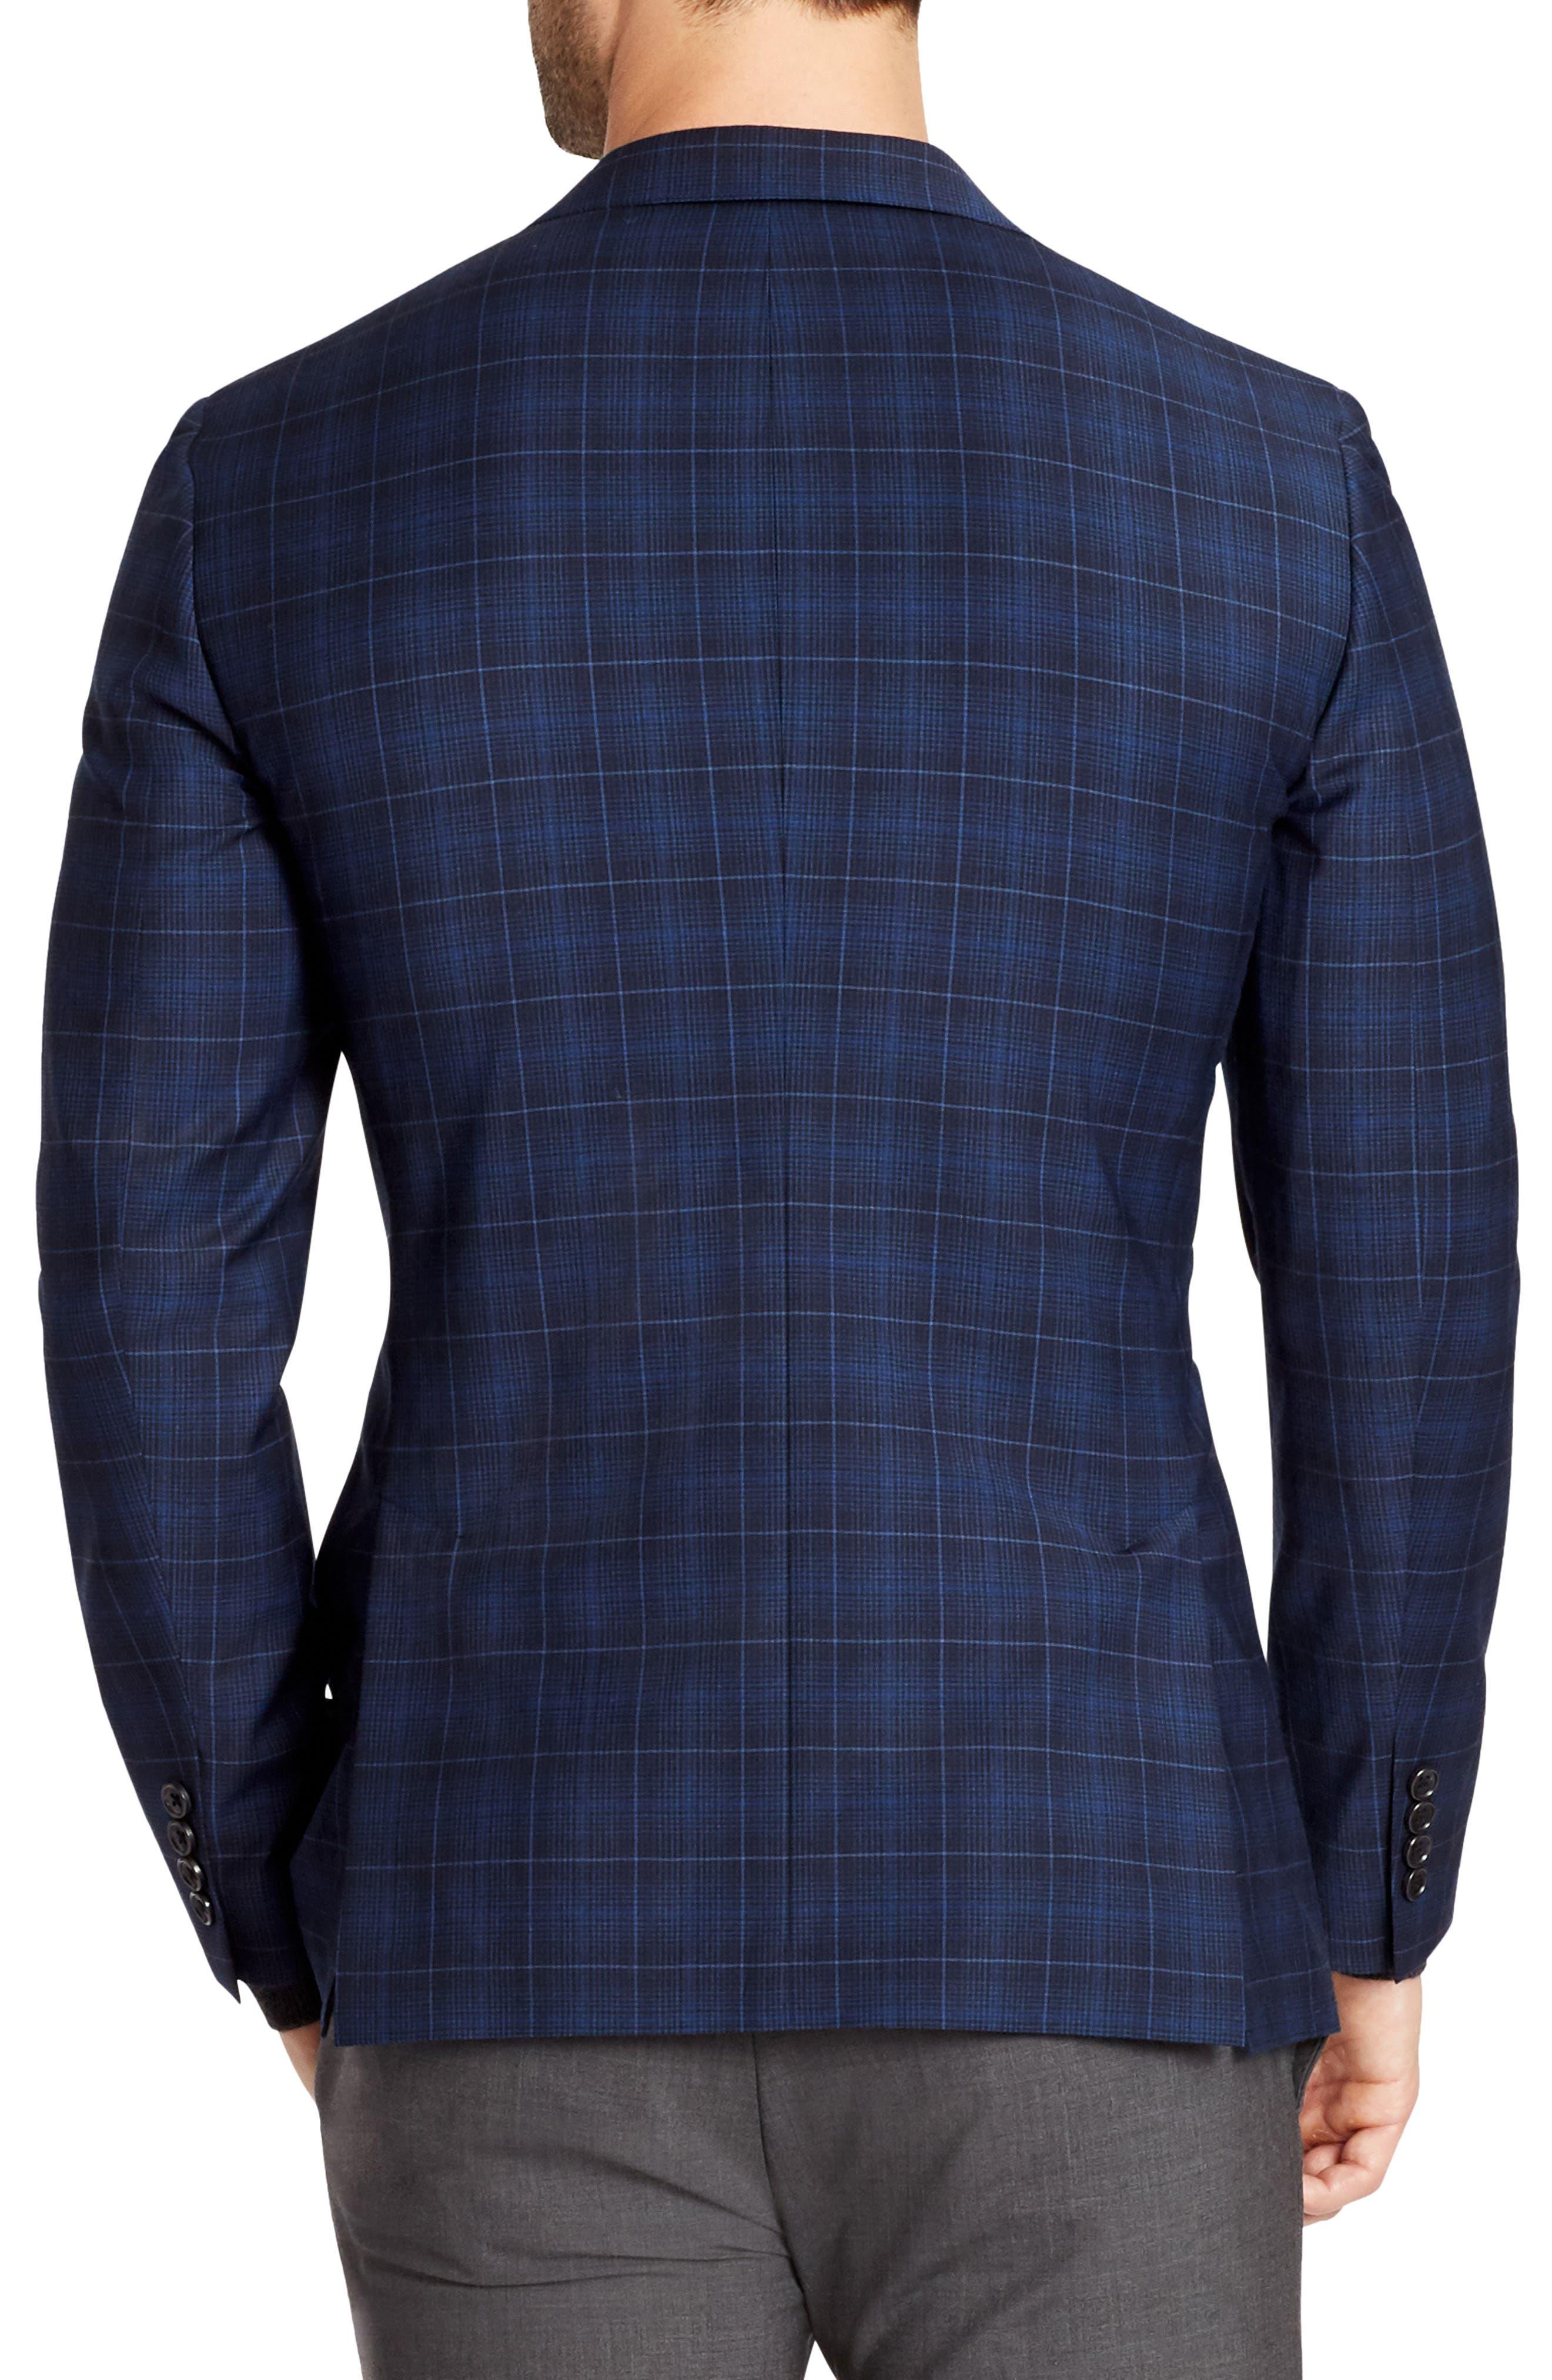 Jetsetter Slim Fit Plaid Wool Sport Coat,                             Alternate thumbnail 2, color,                             400